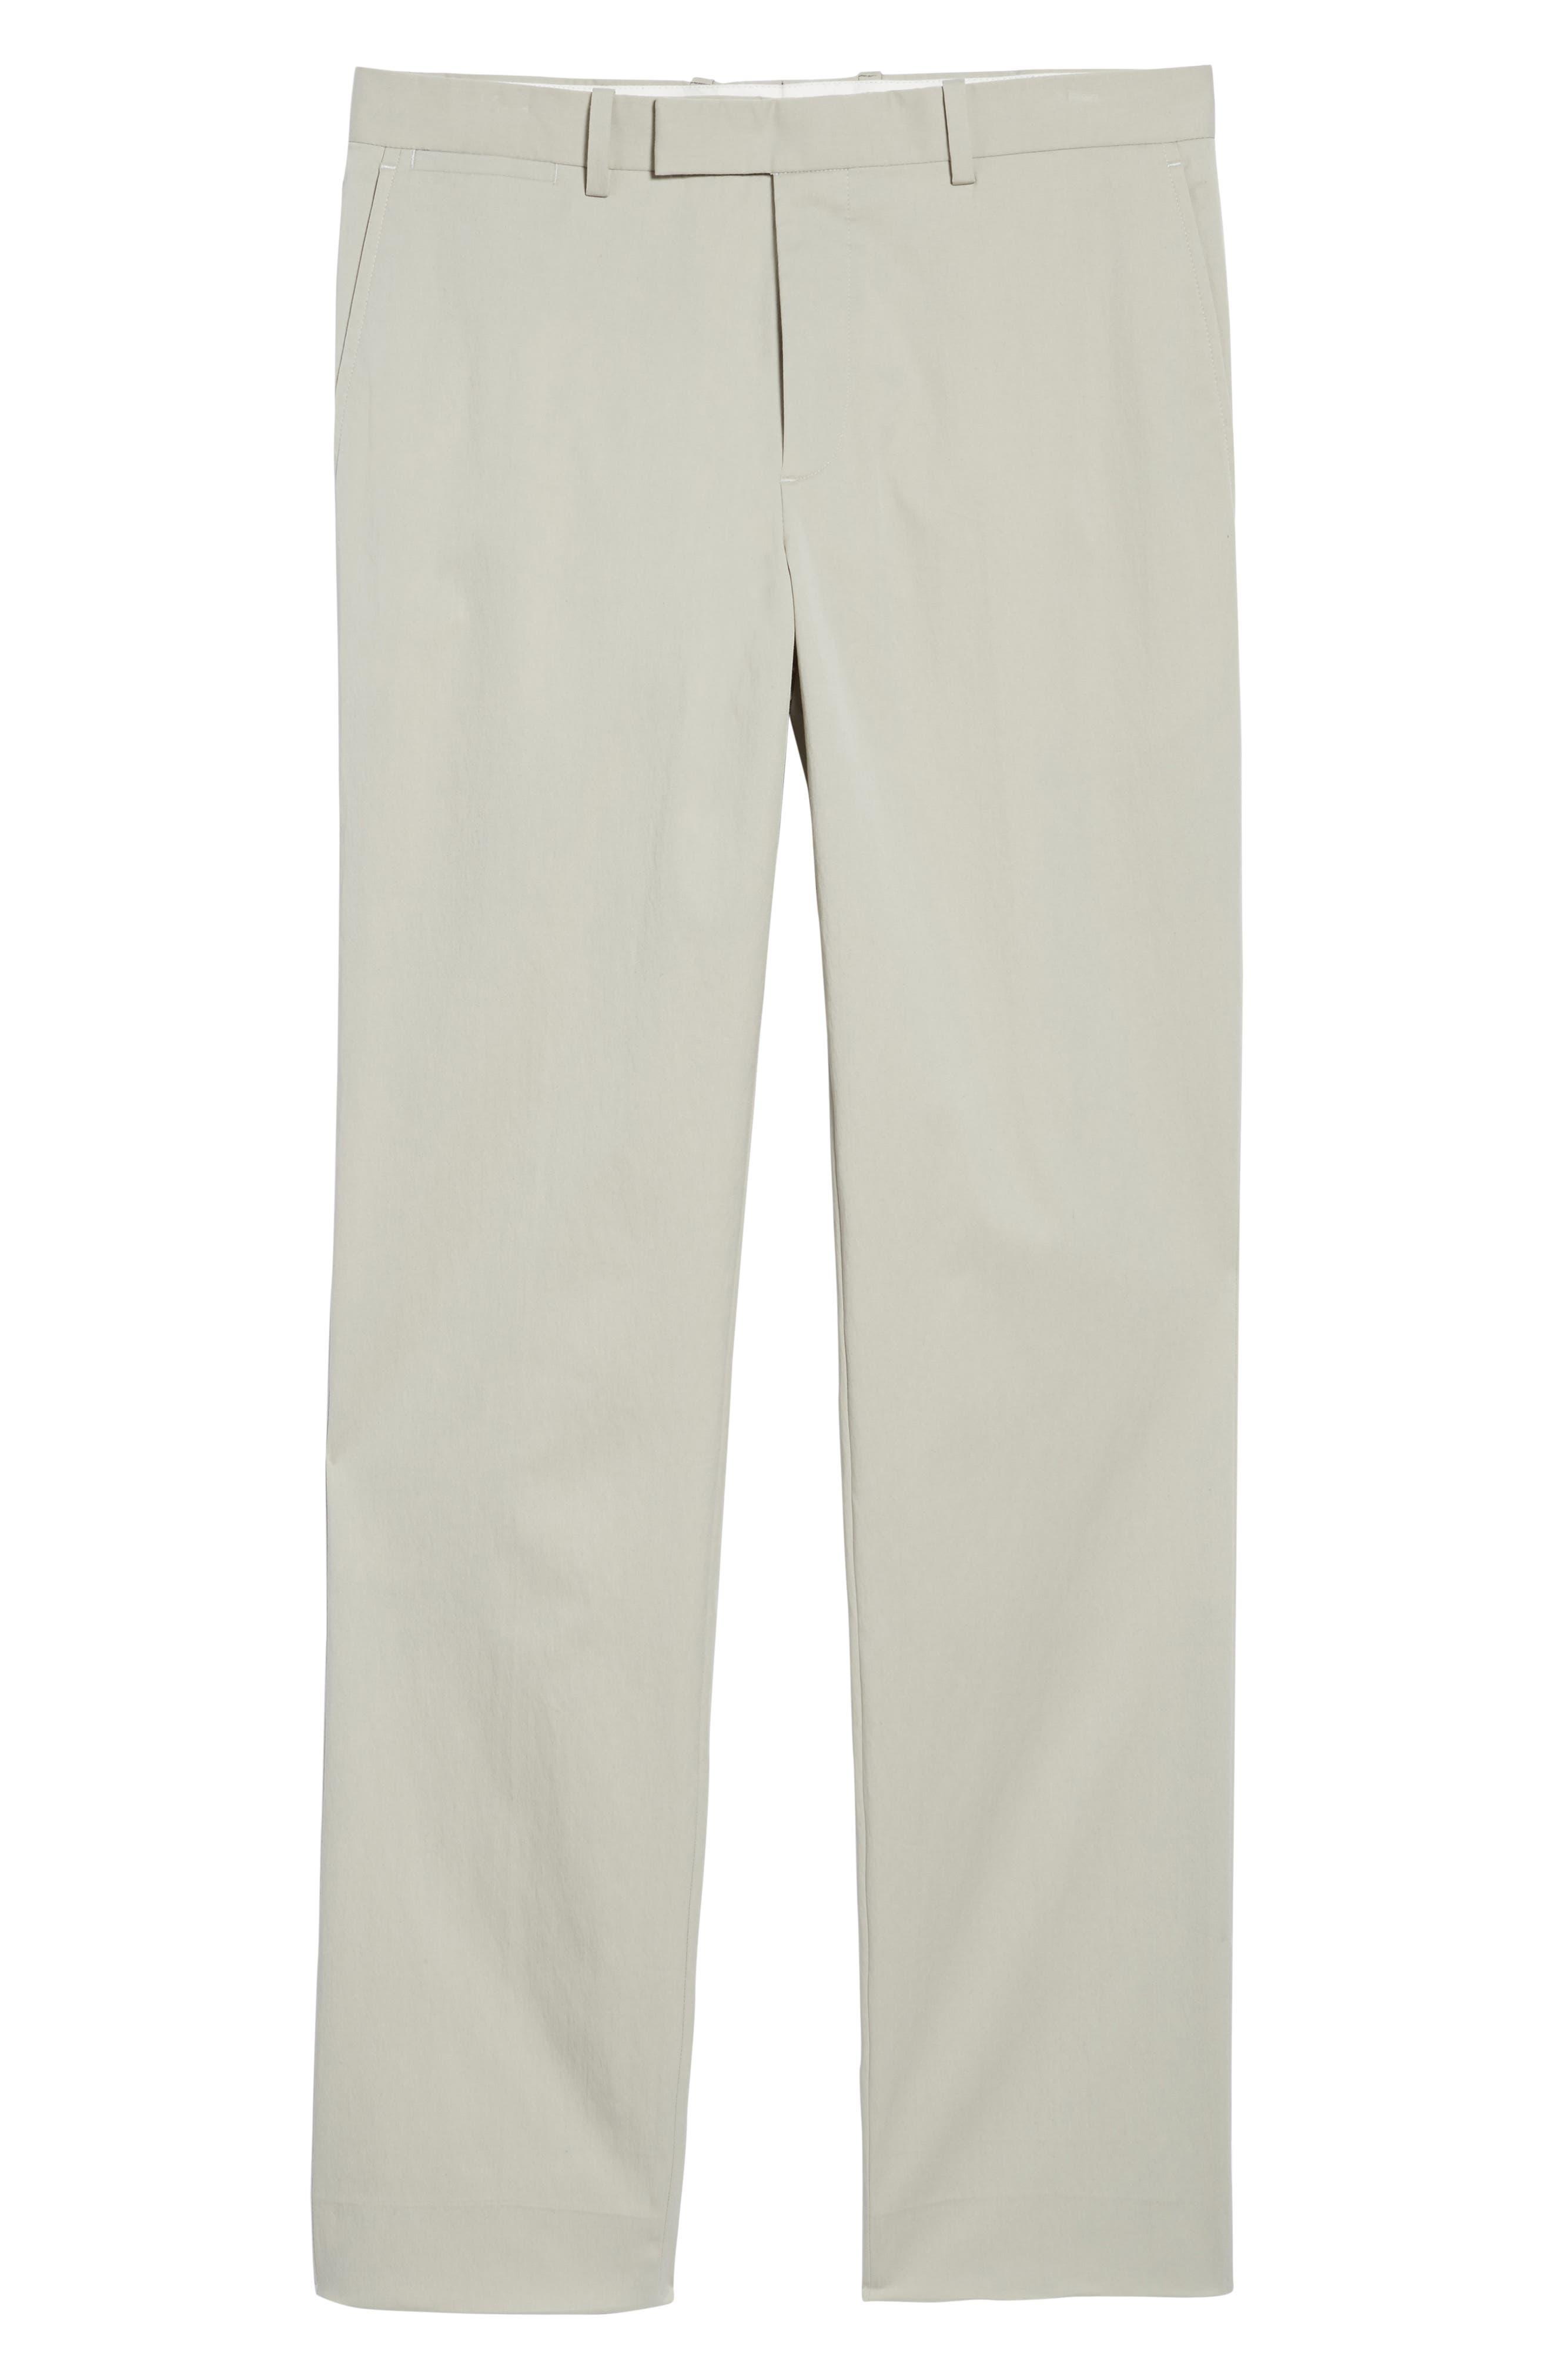 Zaine Technical Flat Front Stretch Pants,                             Alternate thumbnail 6, color,                             Ash